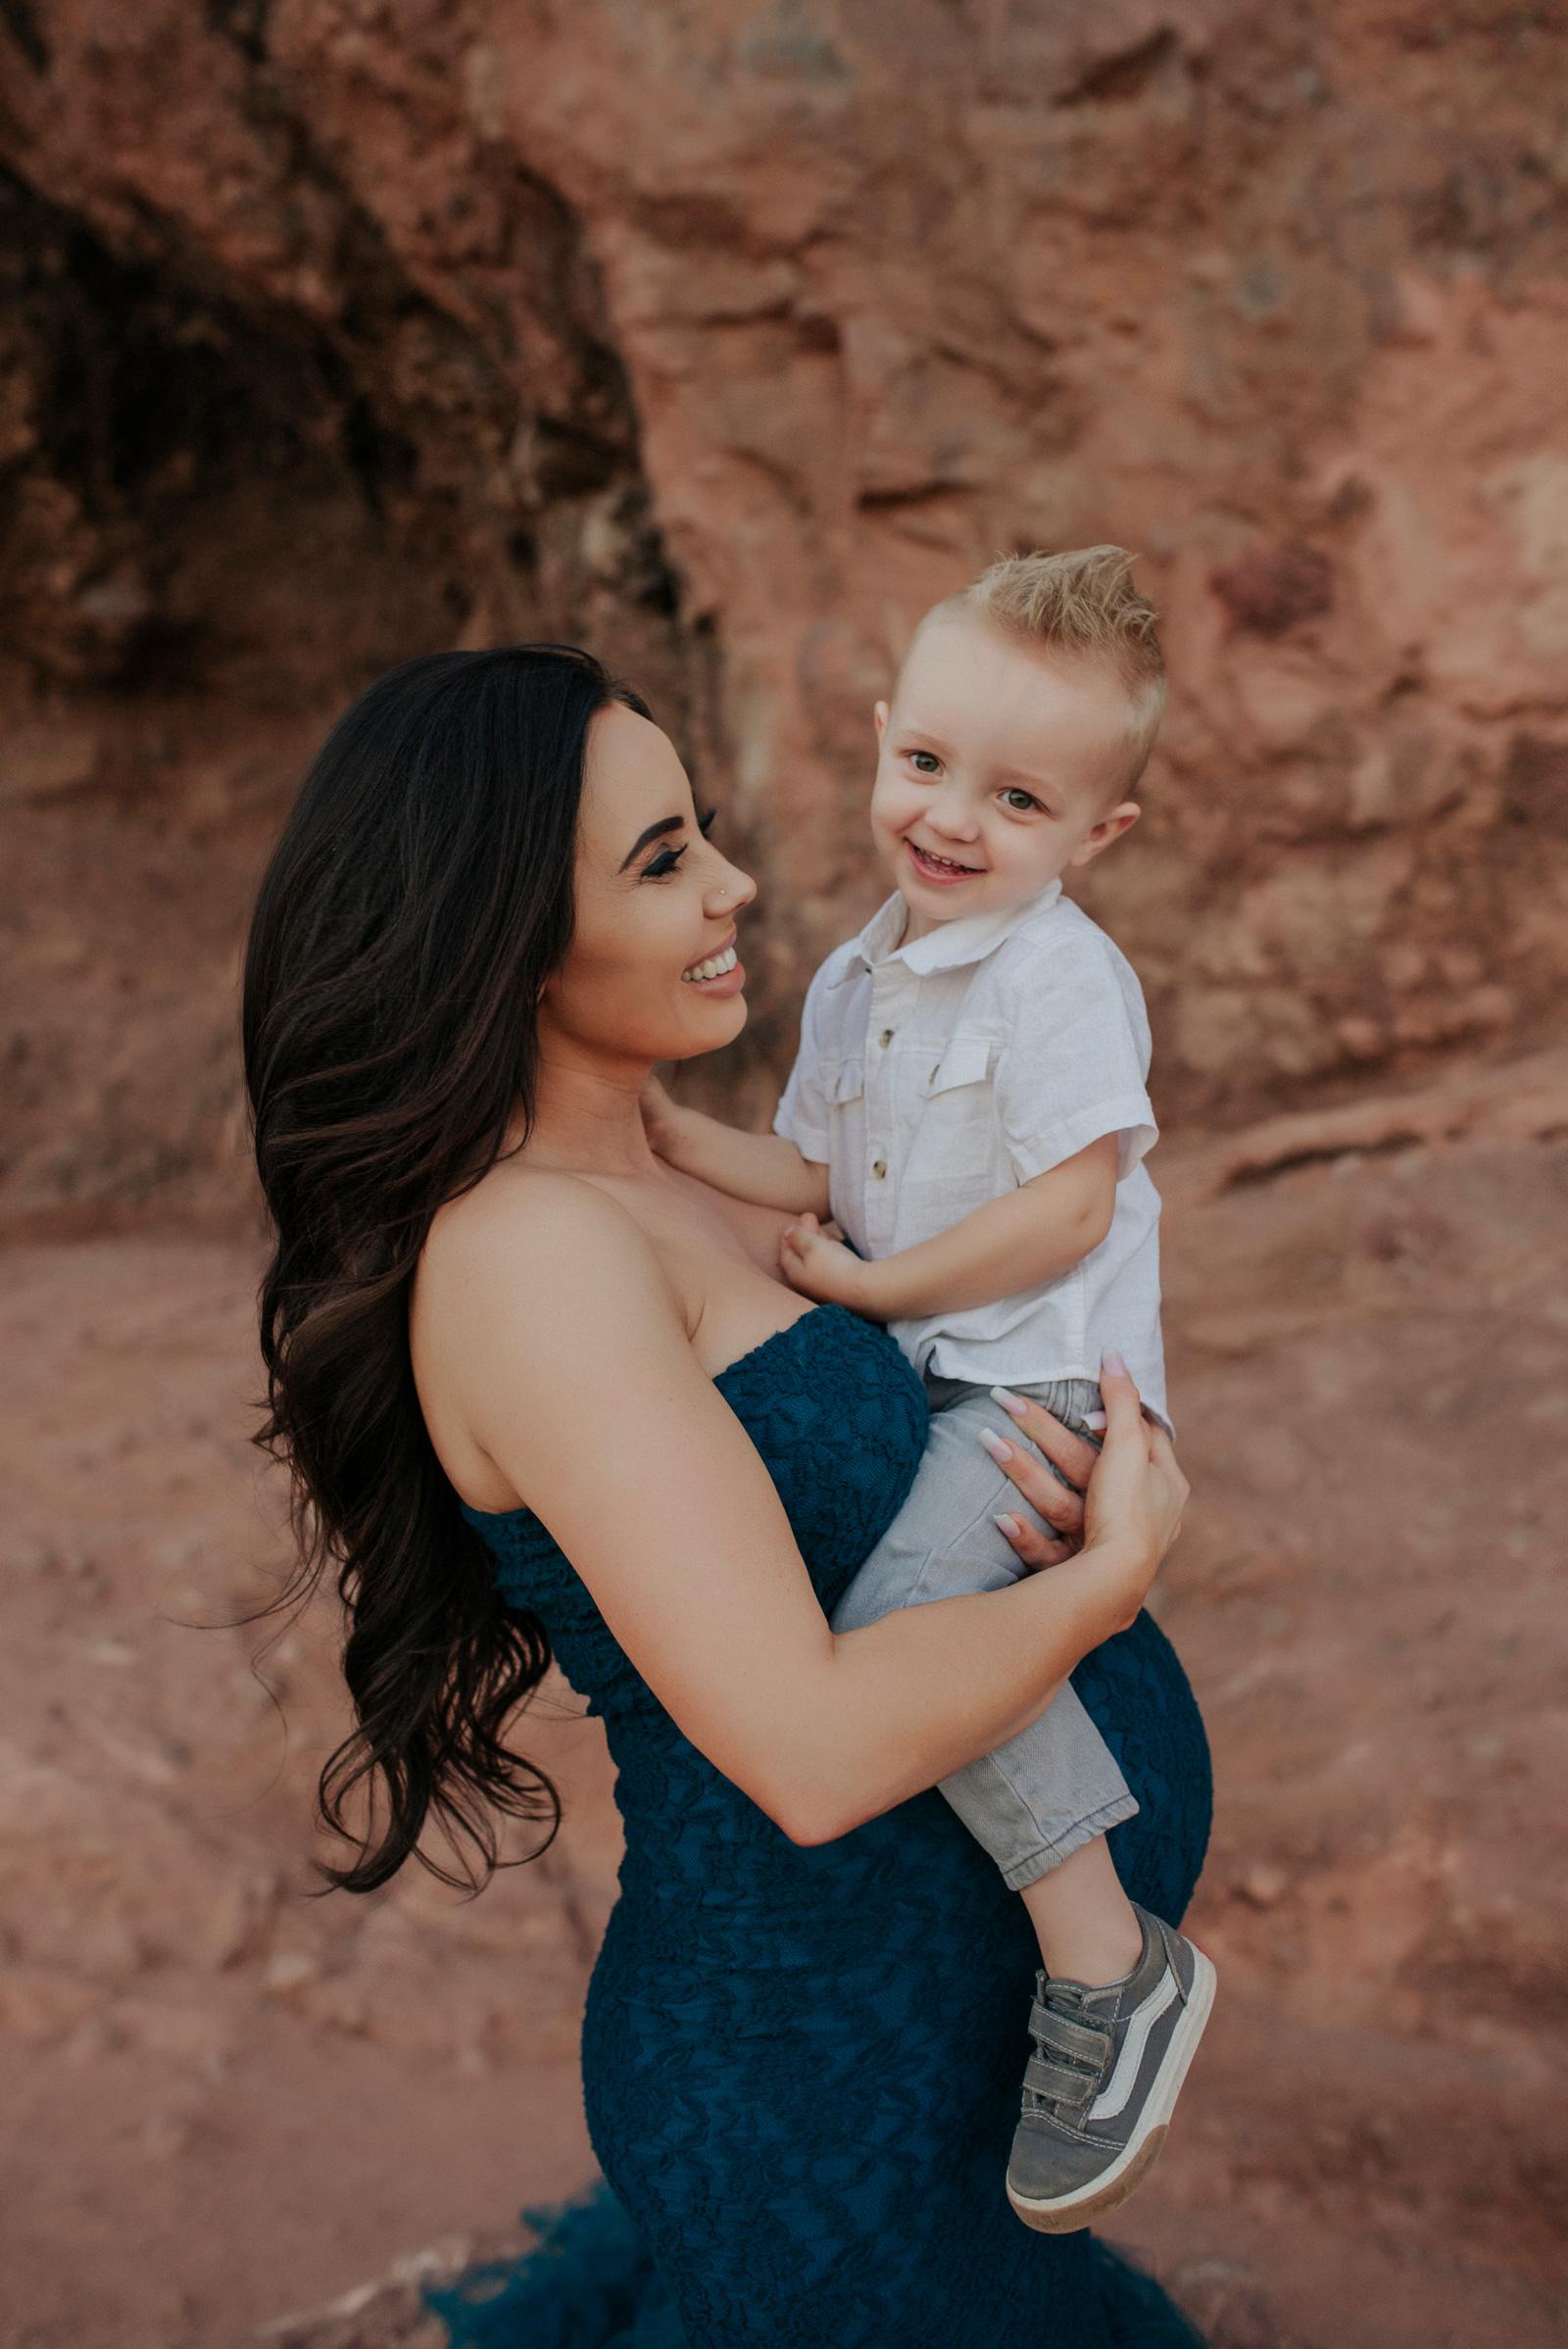 Phoenix Maternity Photographer, Dallas Maternity Photographer, Babymoon Photographer, Travel Photographer, Destination Photographer, Luxury Maternity Photographer, NYC Maternity Photographer